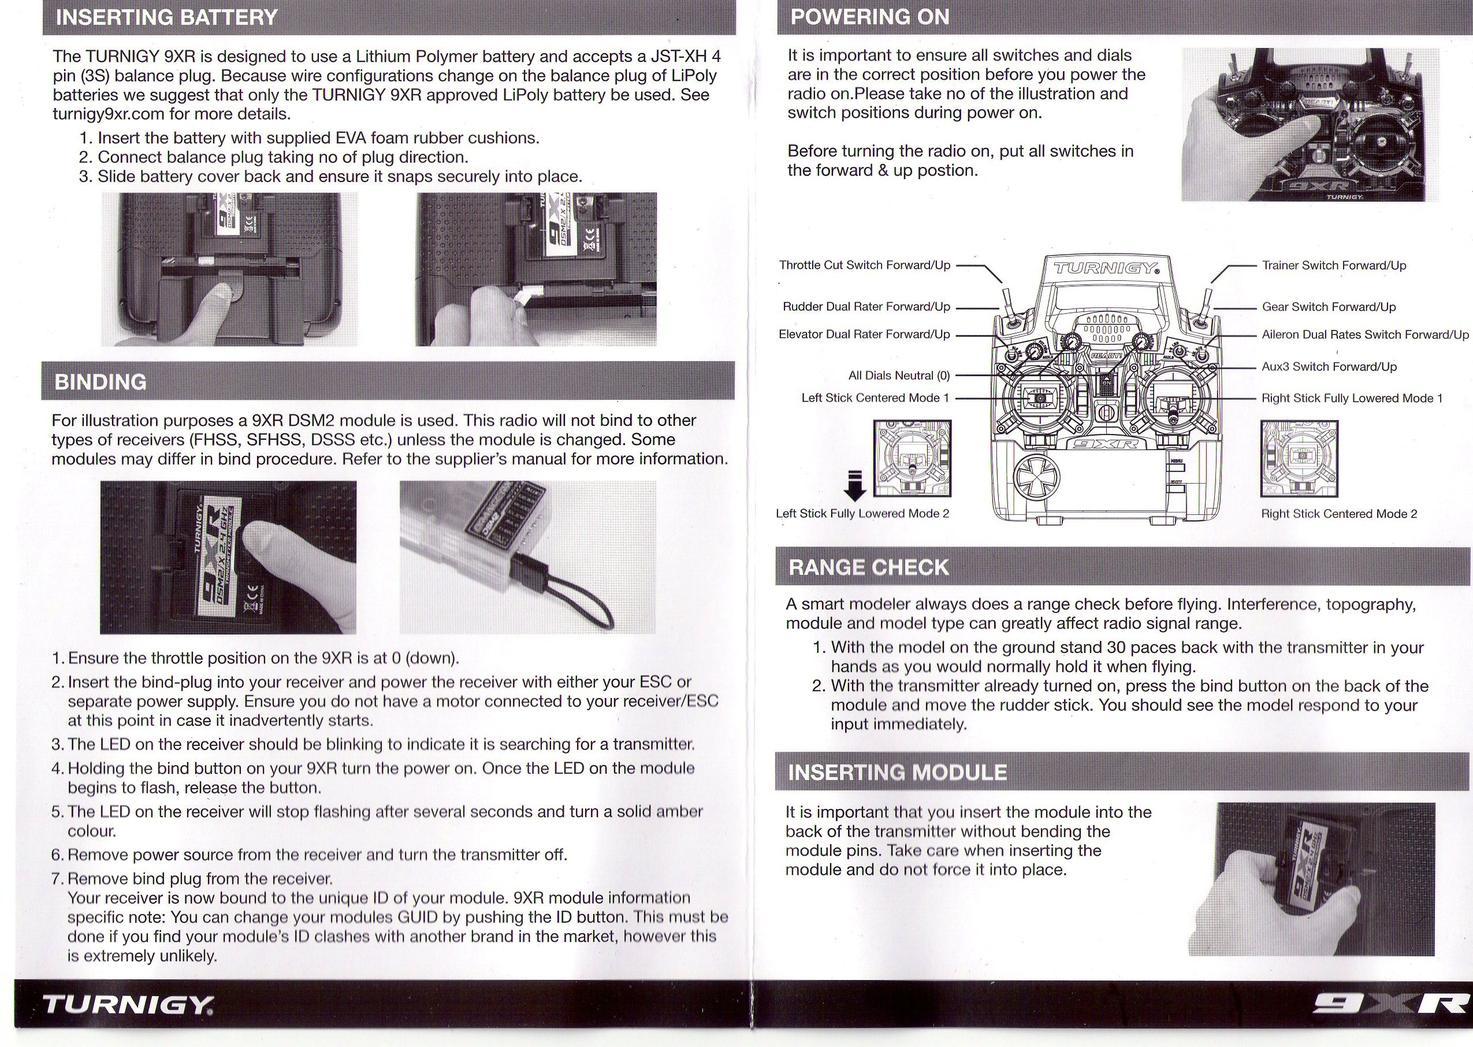 9xr pro manual.